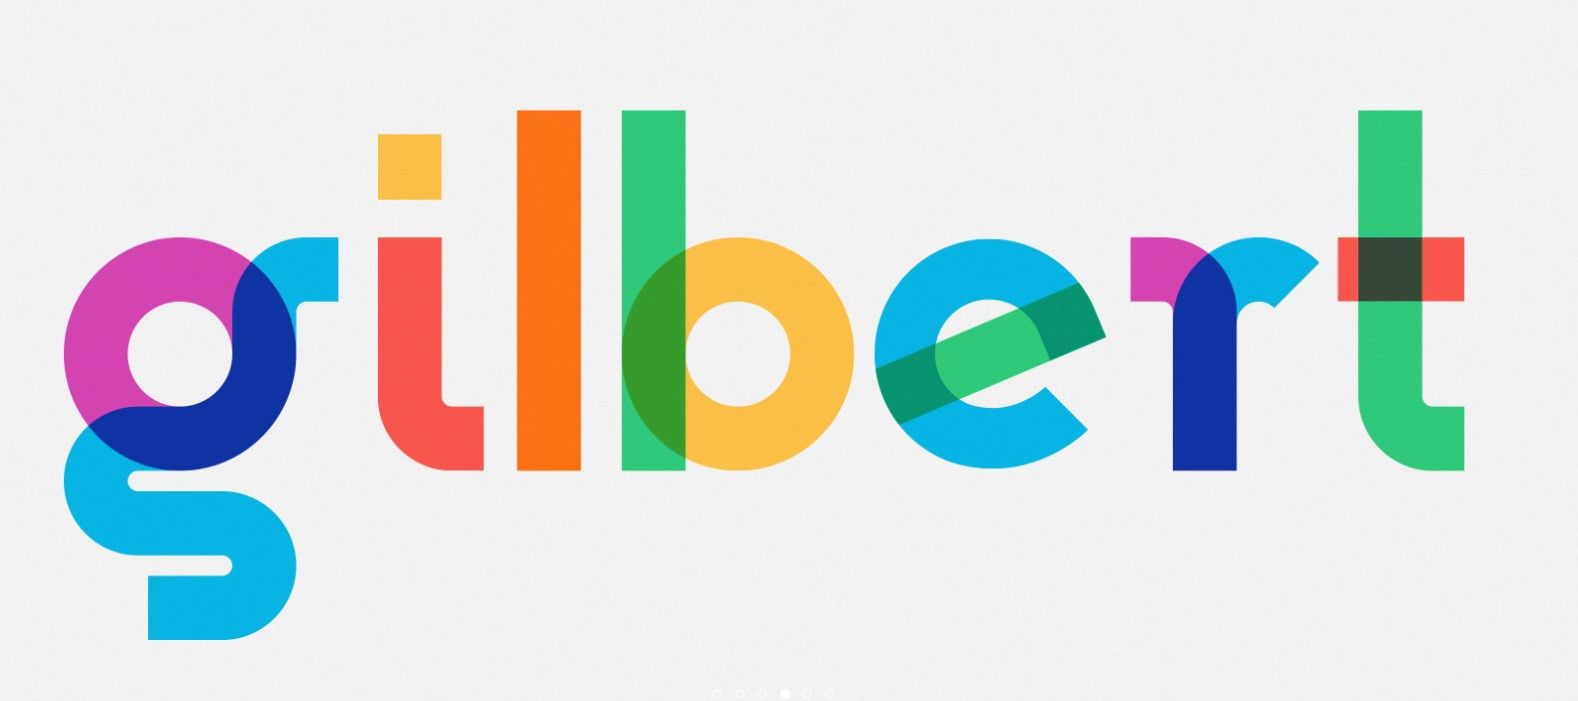 Melhores fontes gratuitas - gilbert baker